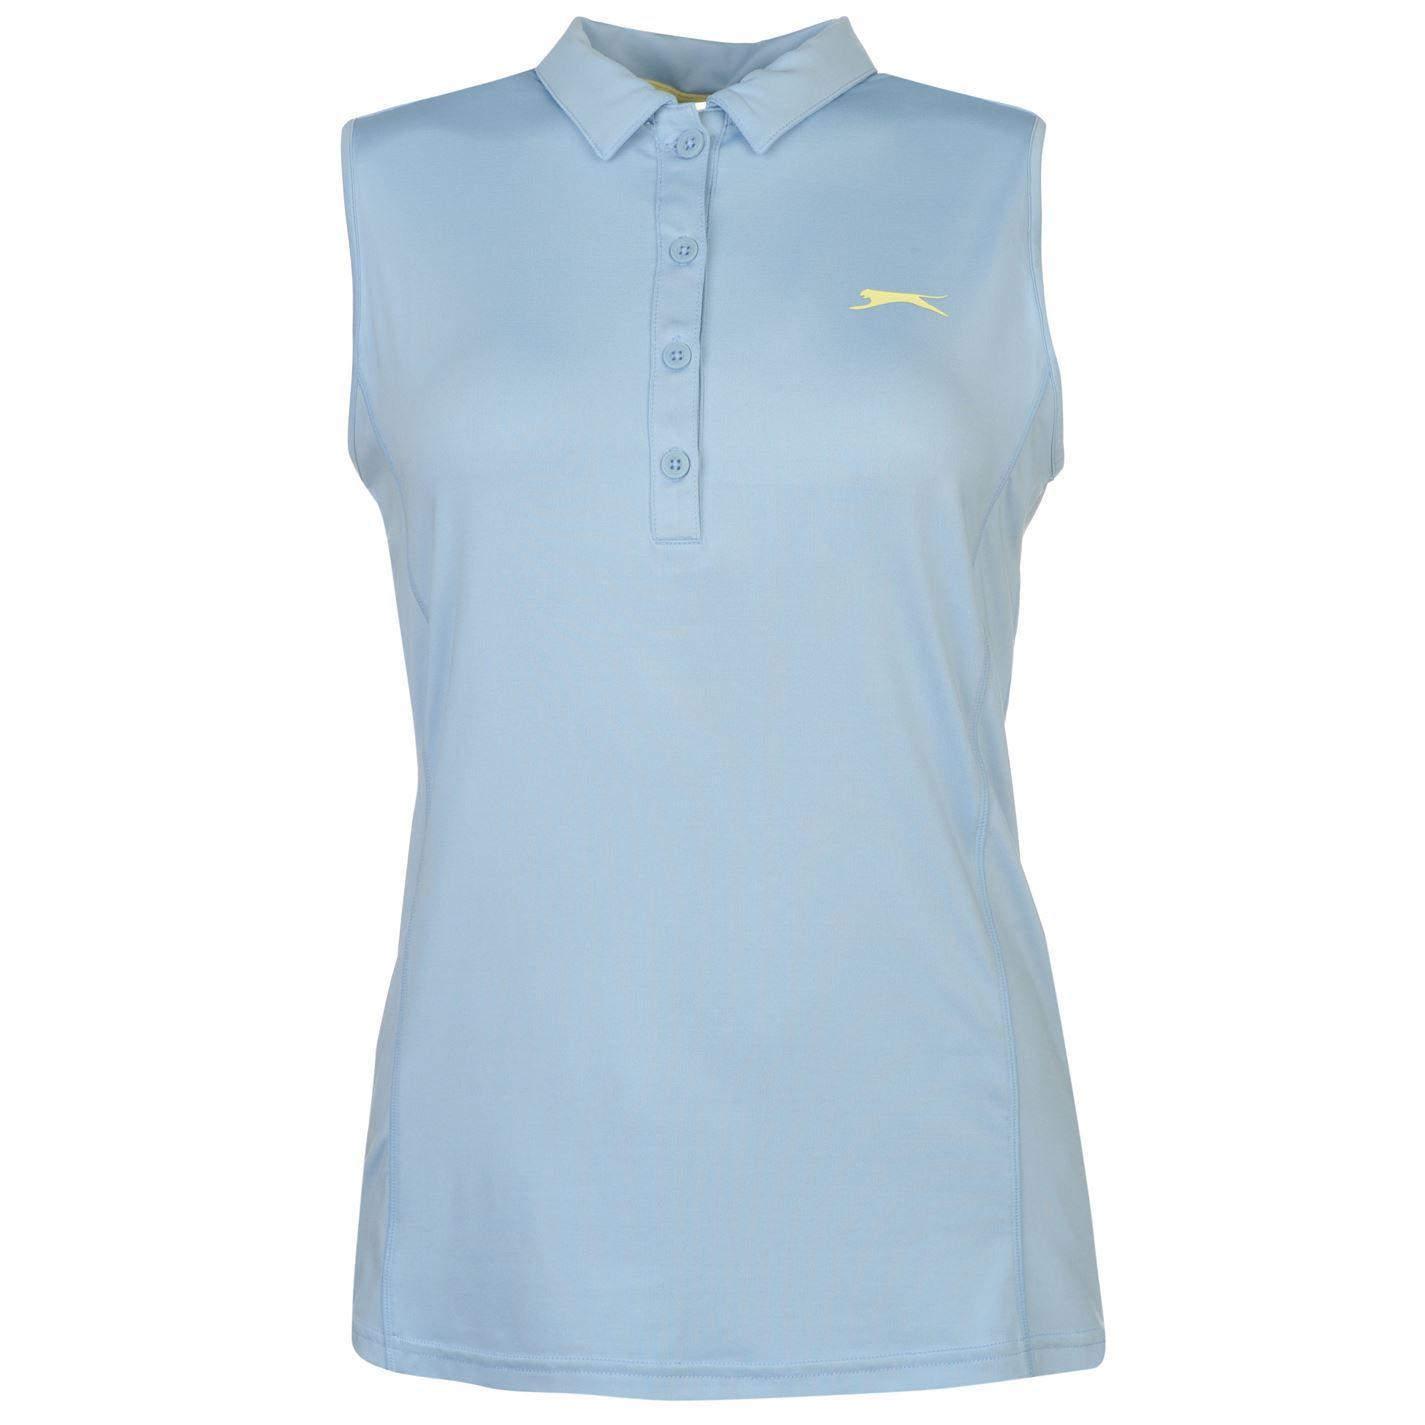 Slazenger Womens Sleeveless Golf Polo Tee Shirt Top